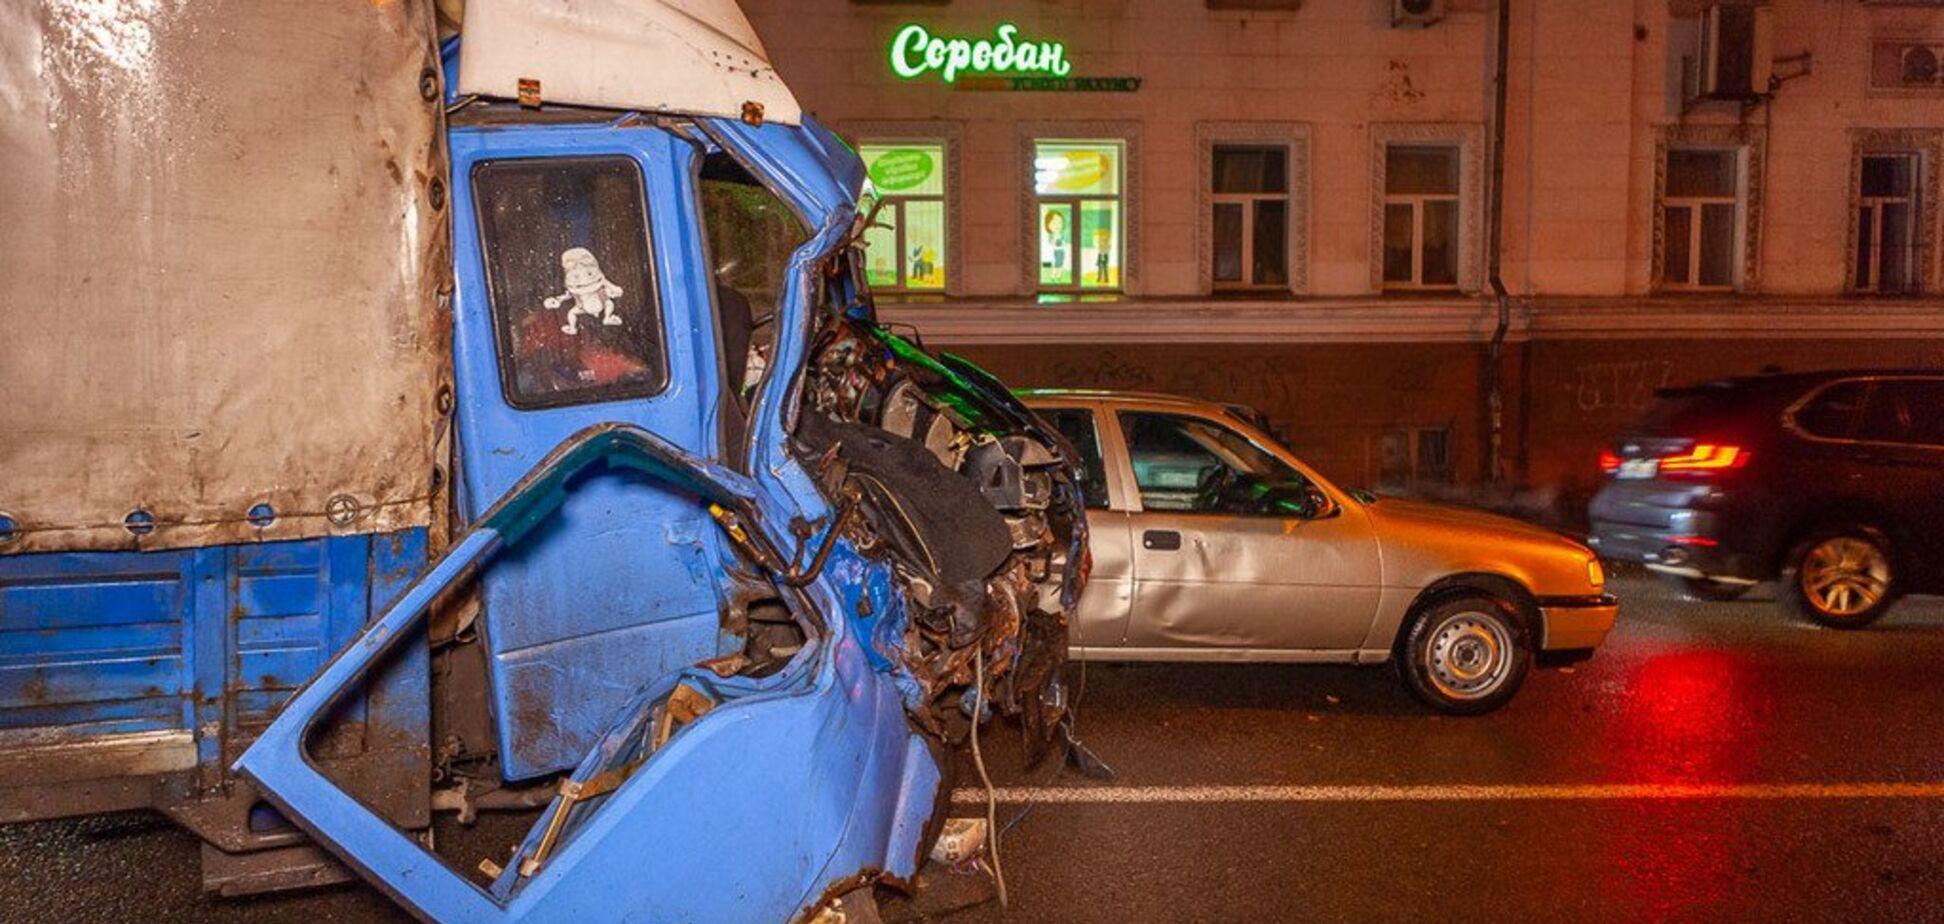 Отказали тормоза: в центре Днепра произошло жуткое ДТП с грузовиком. Фото